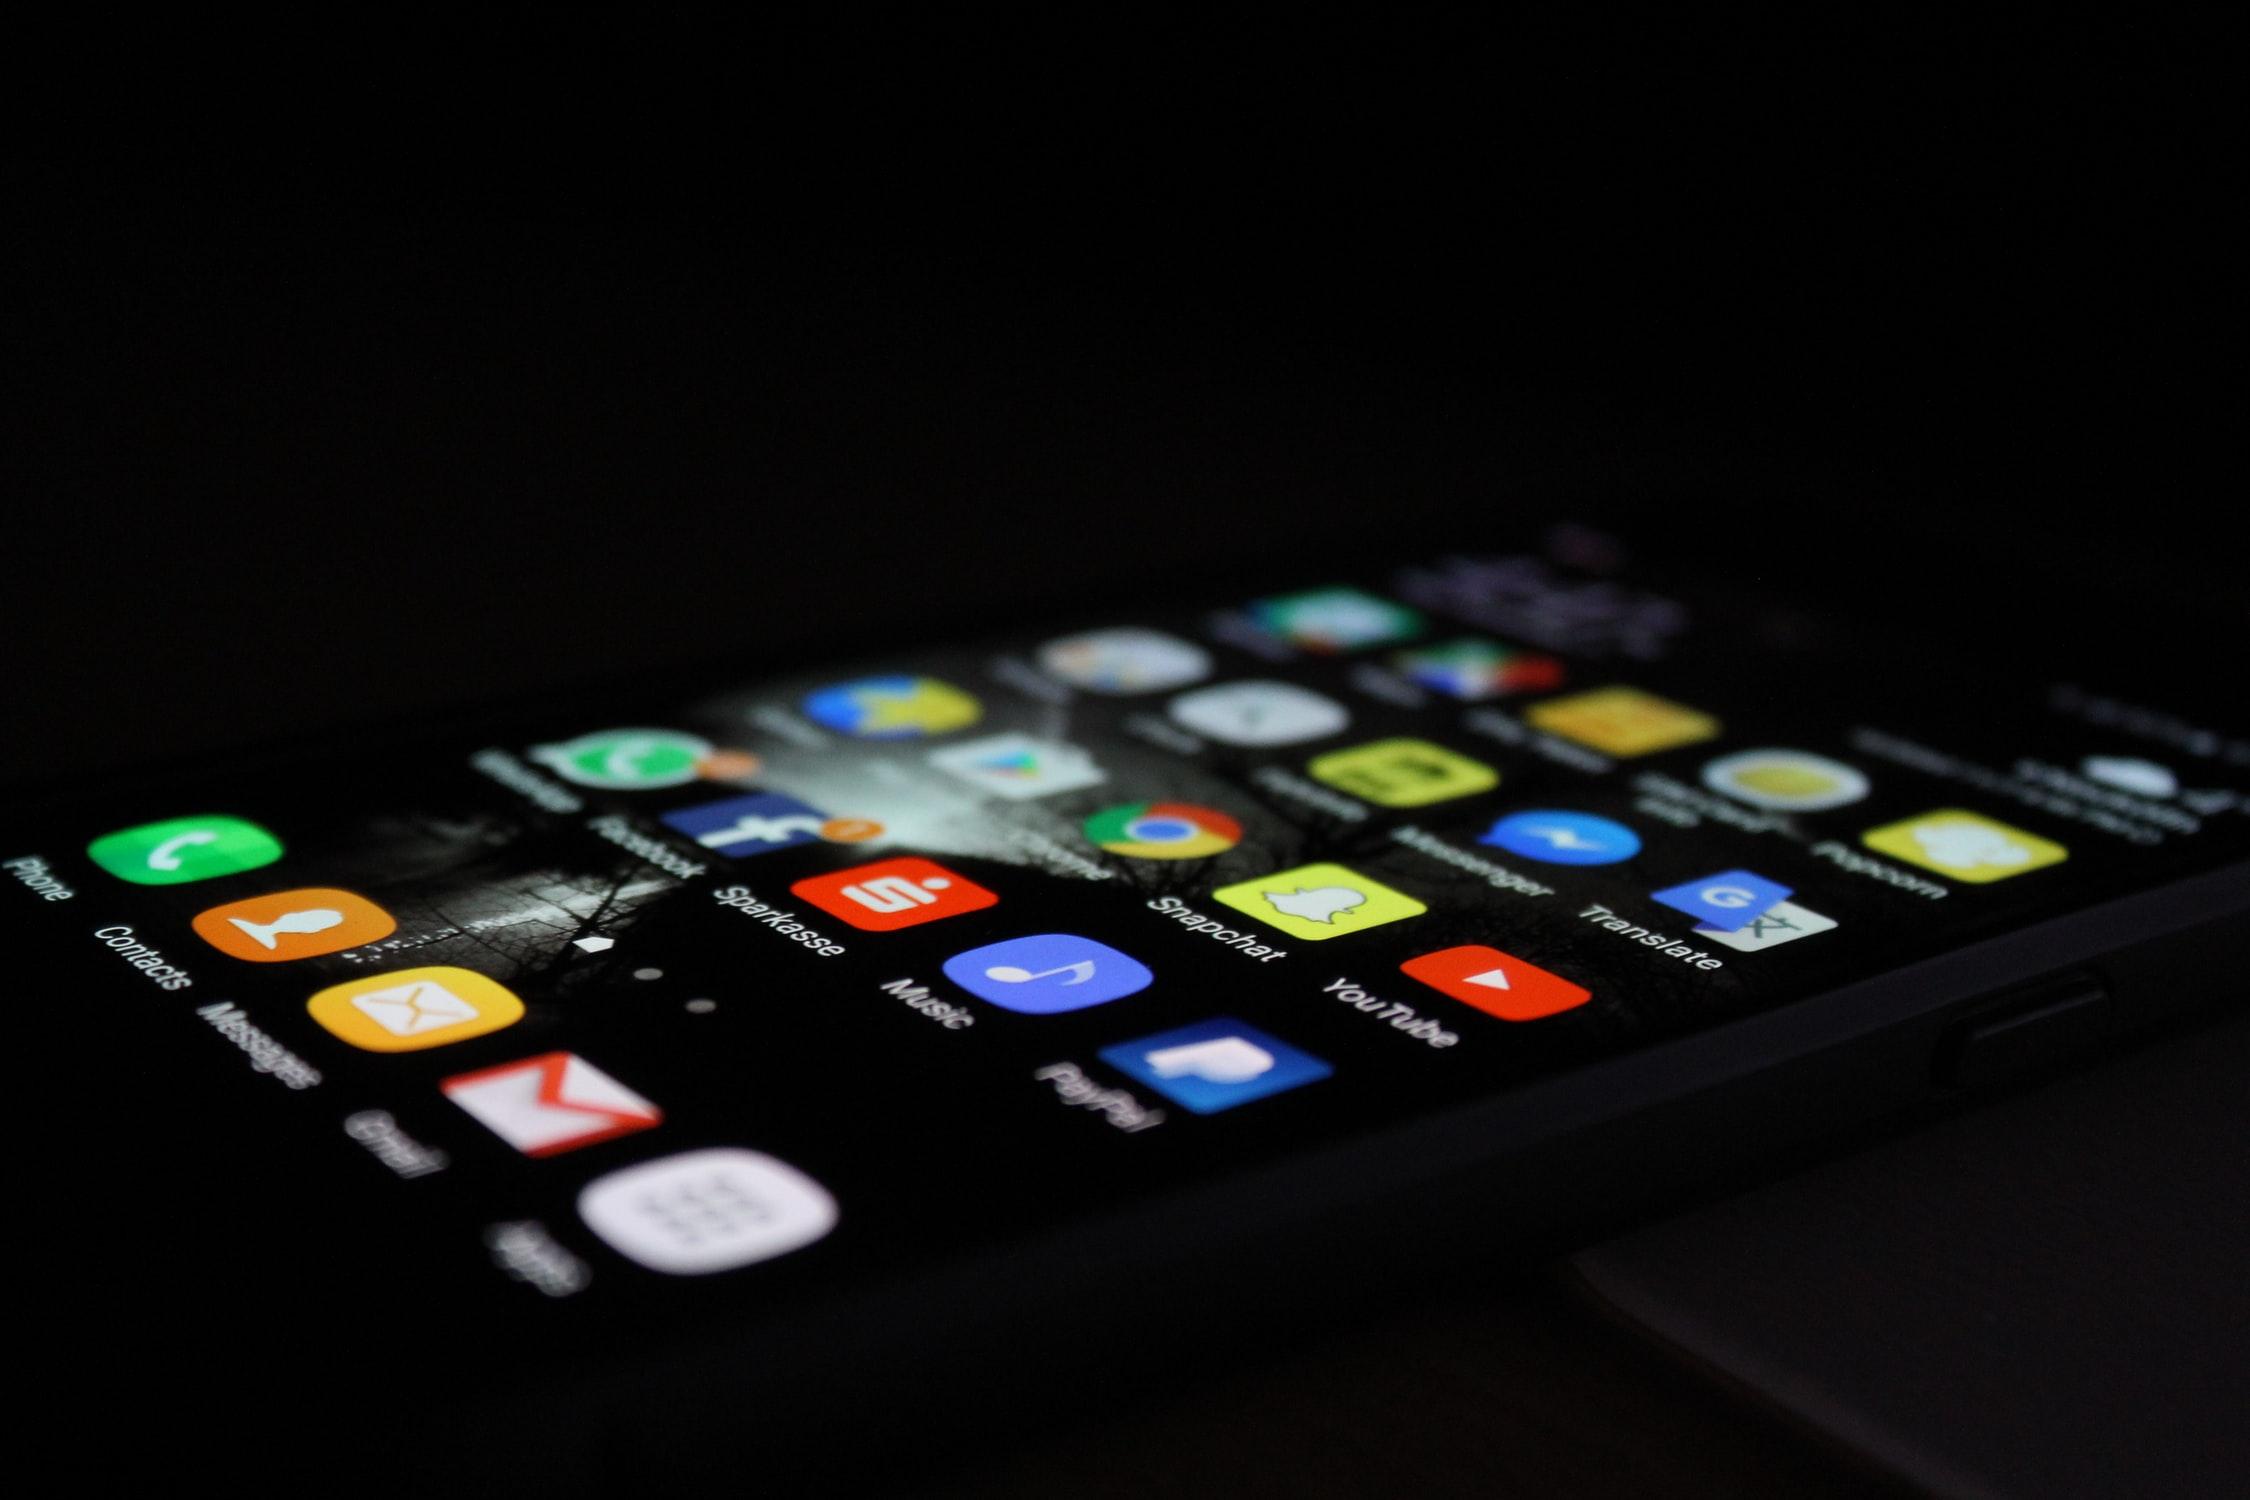 Google 发布公告解释上个月 Android 应用大量崩溃的原因及未来计划